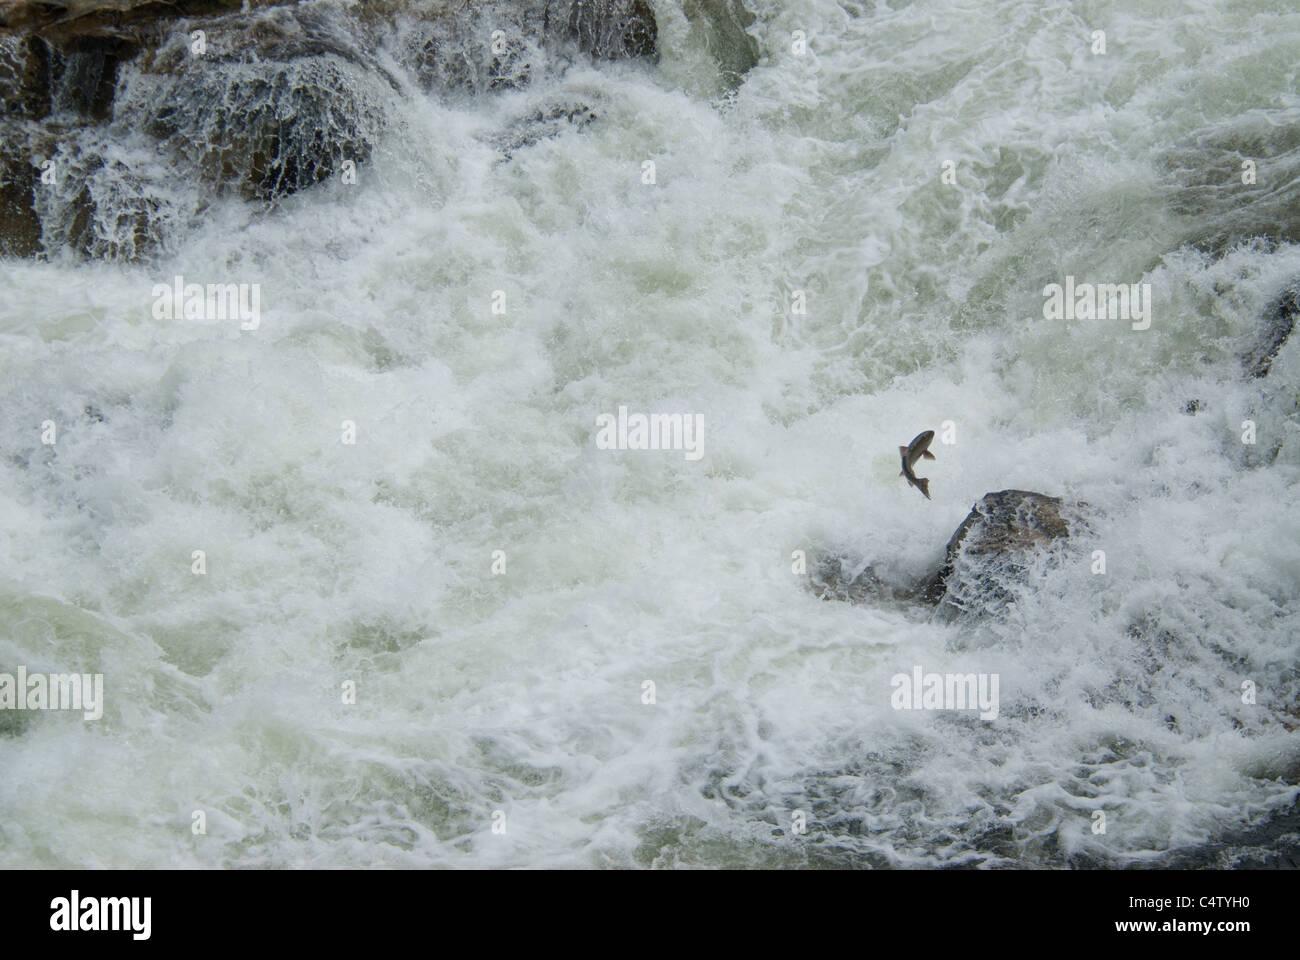 Chinook salmon jumping waterfall - Stock Image